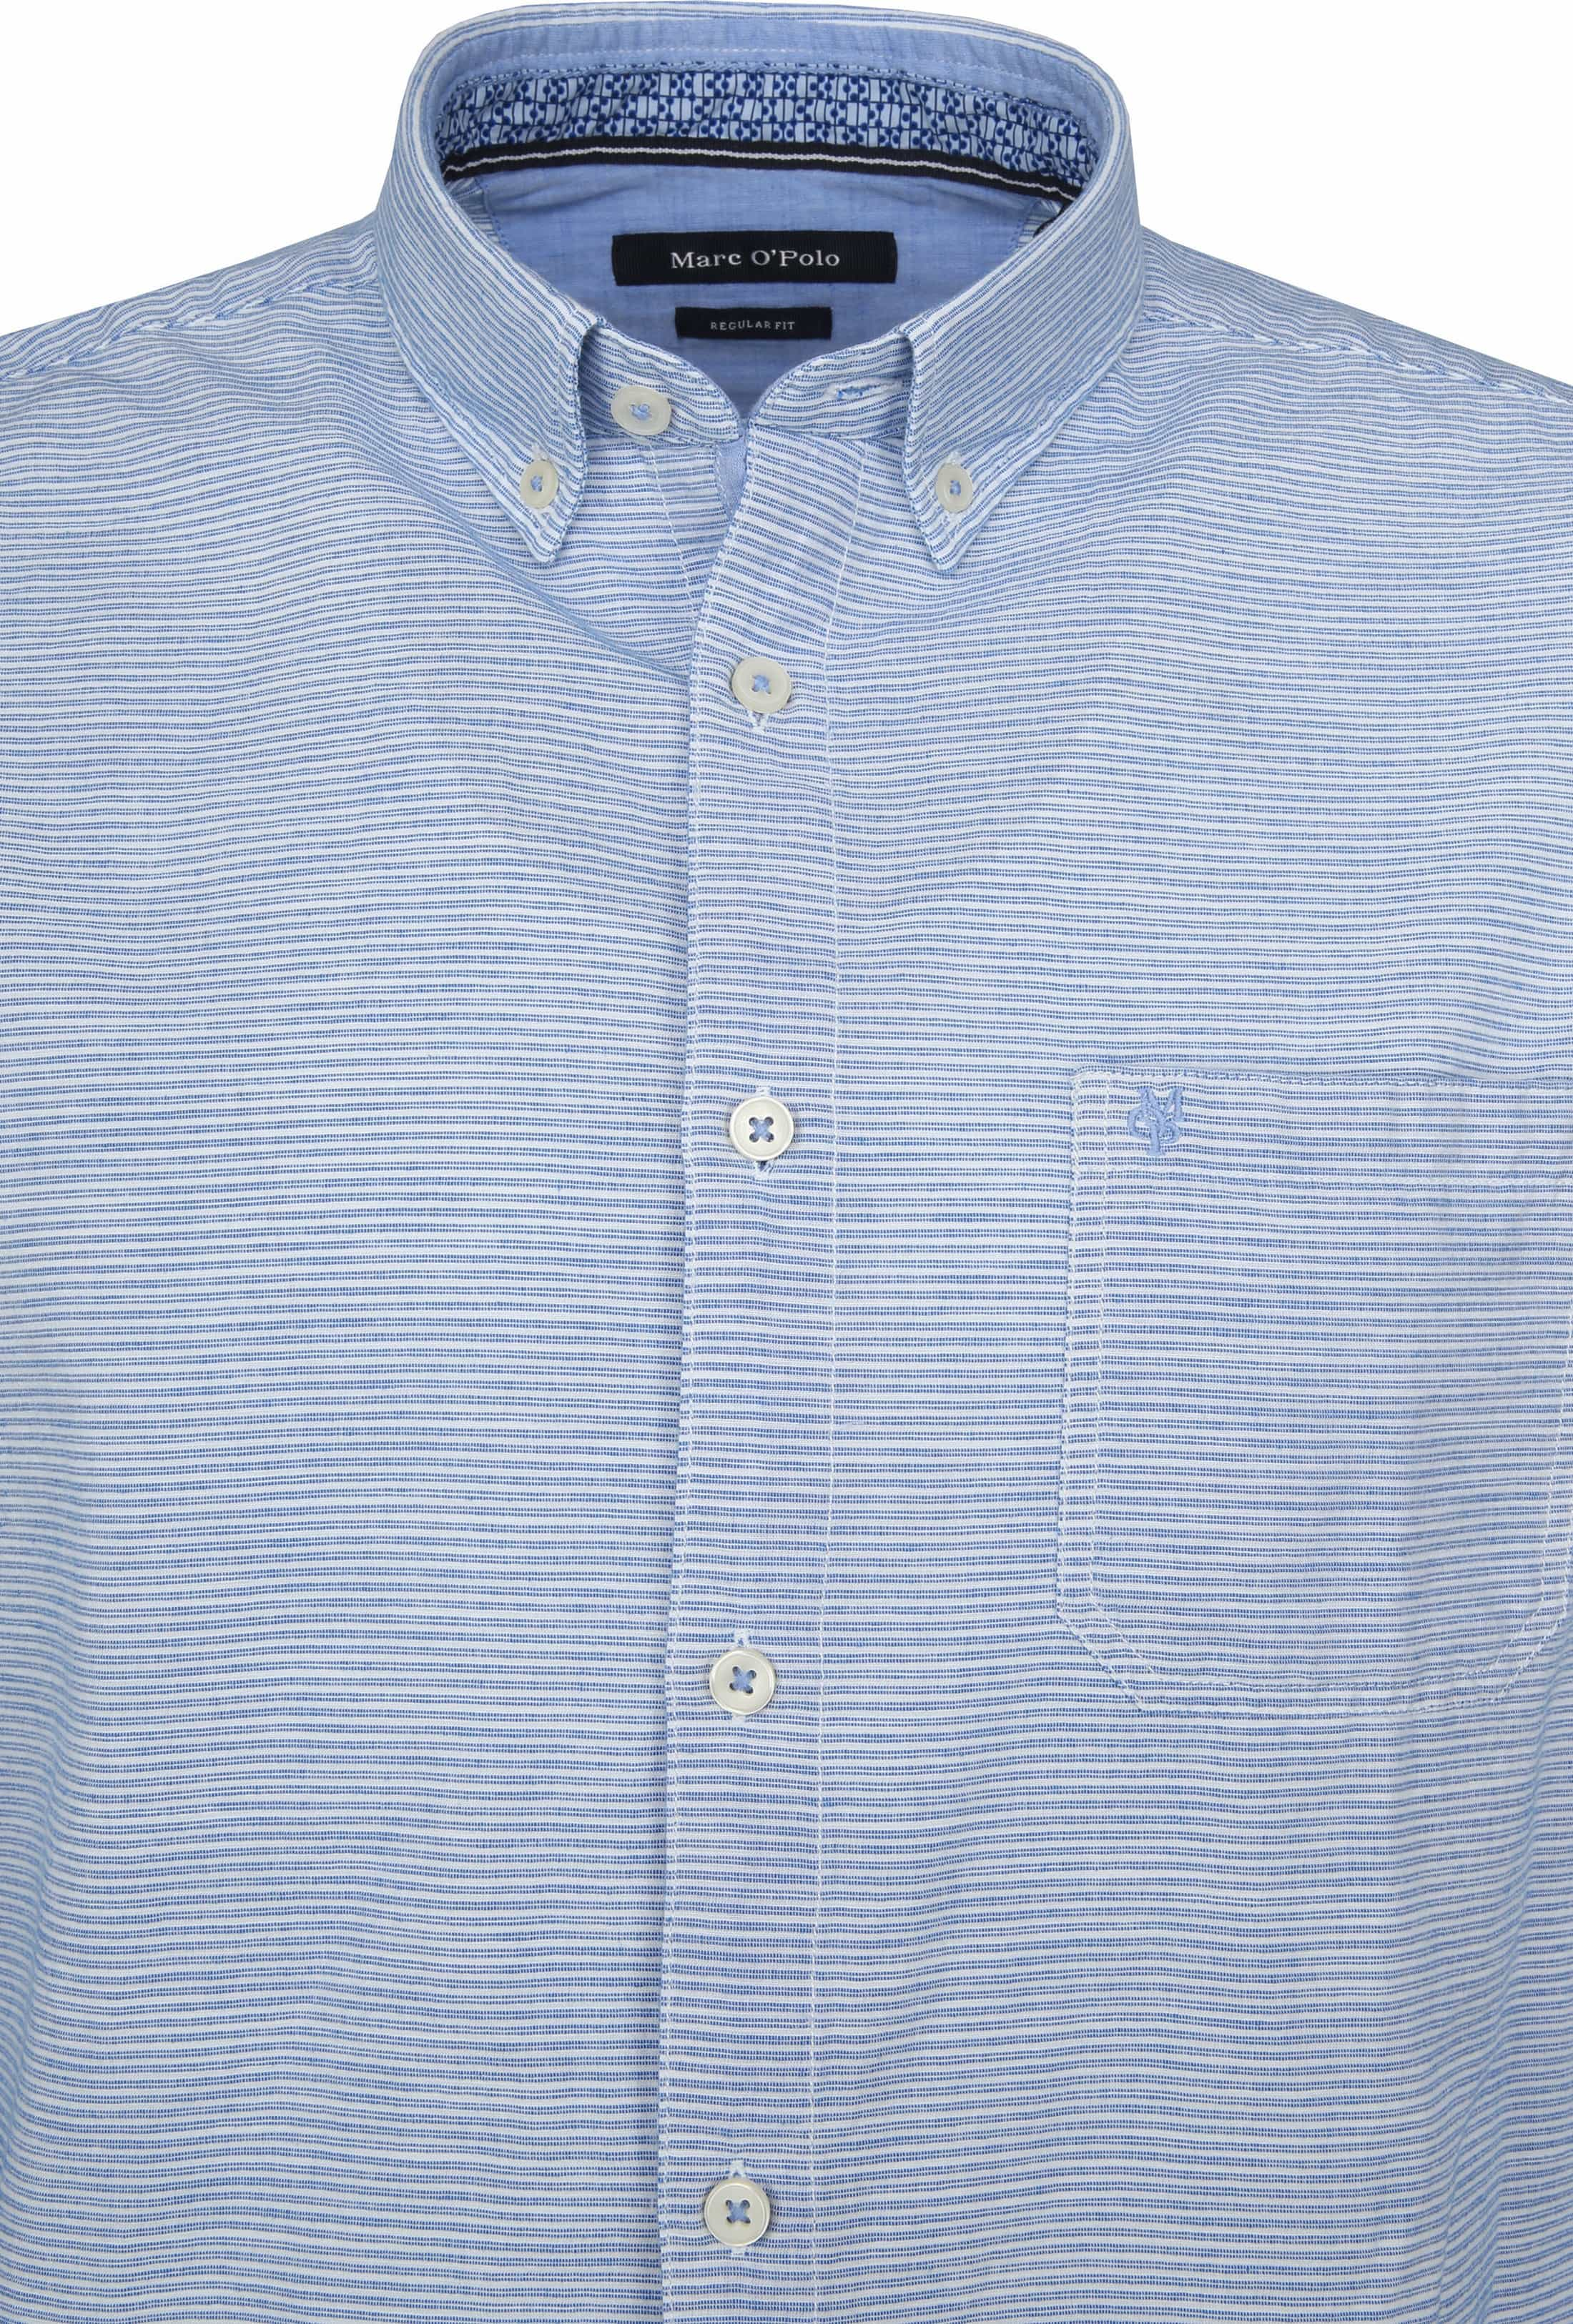 Marc O'Polo Overhemd Strepen Blauw foto 2